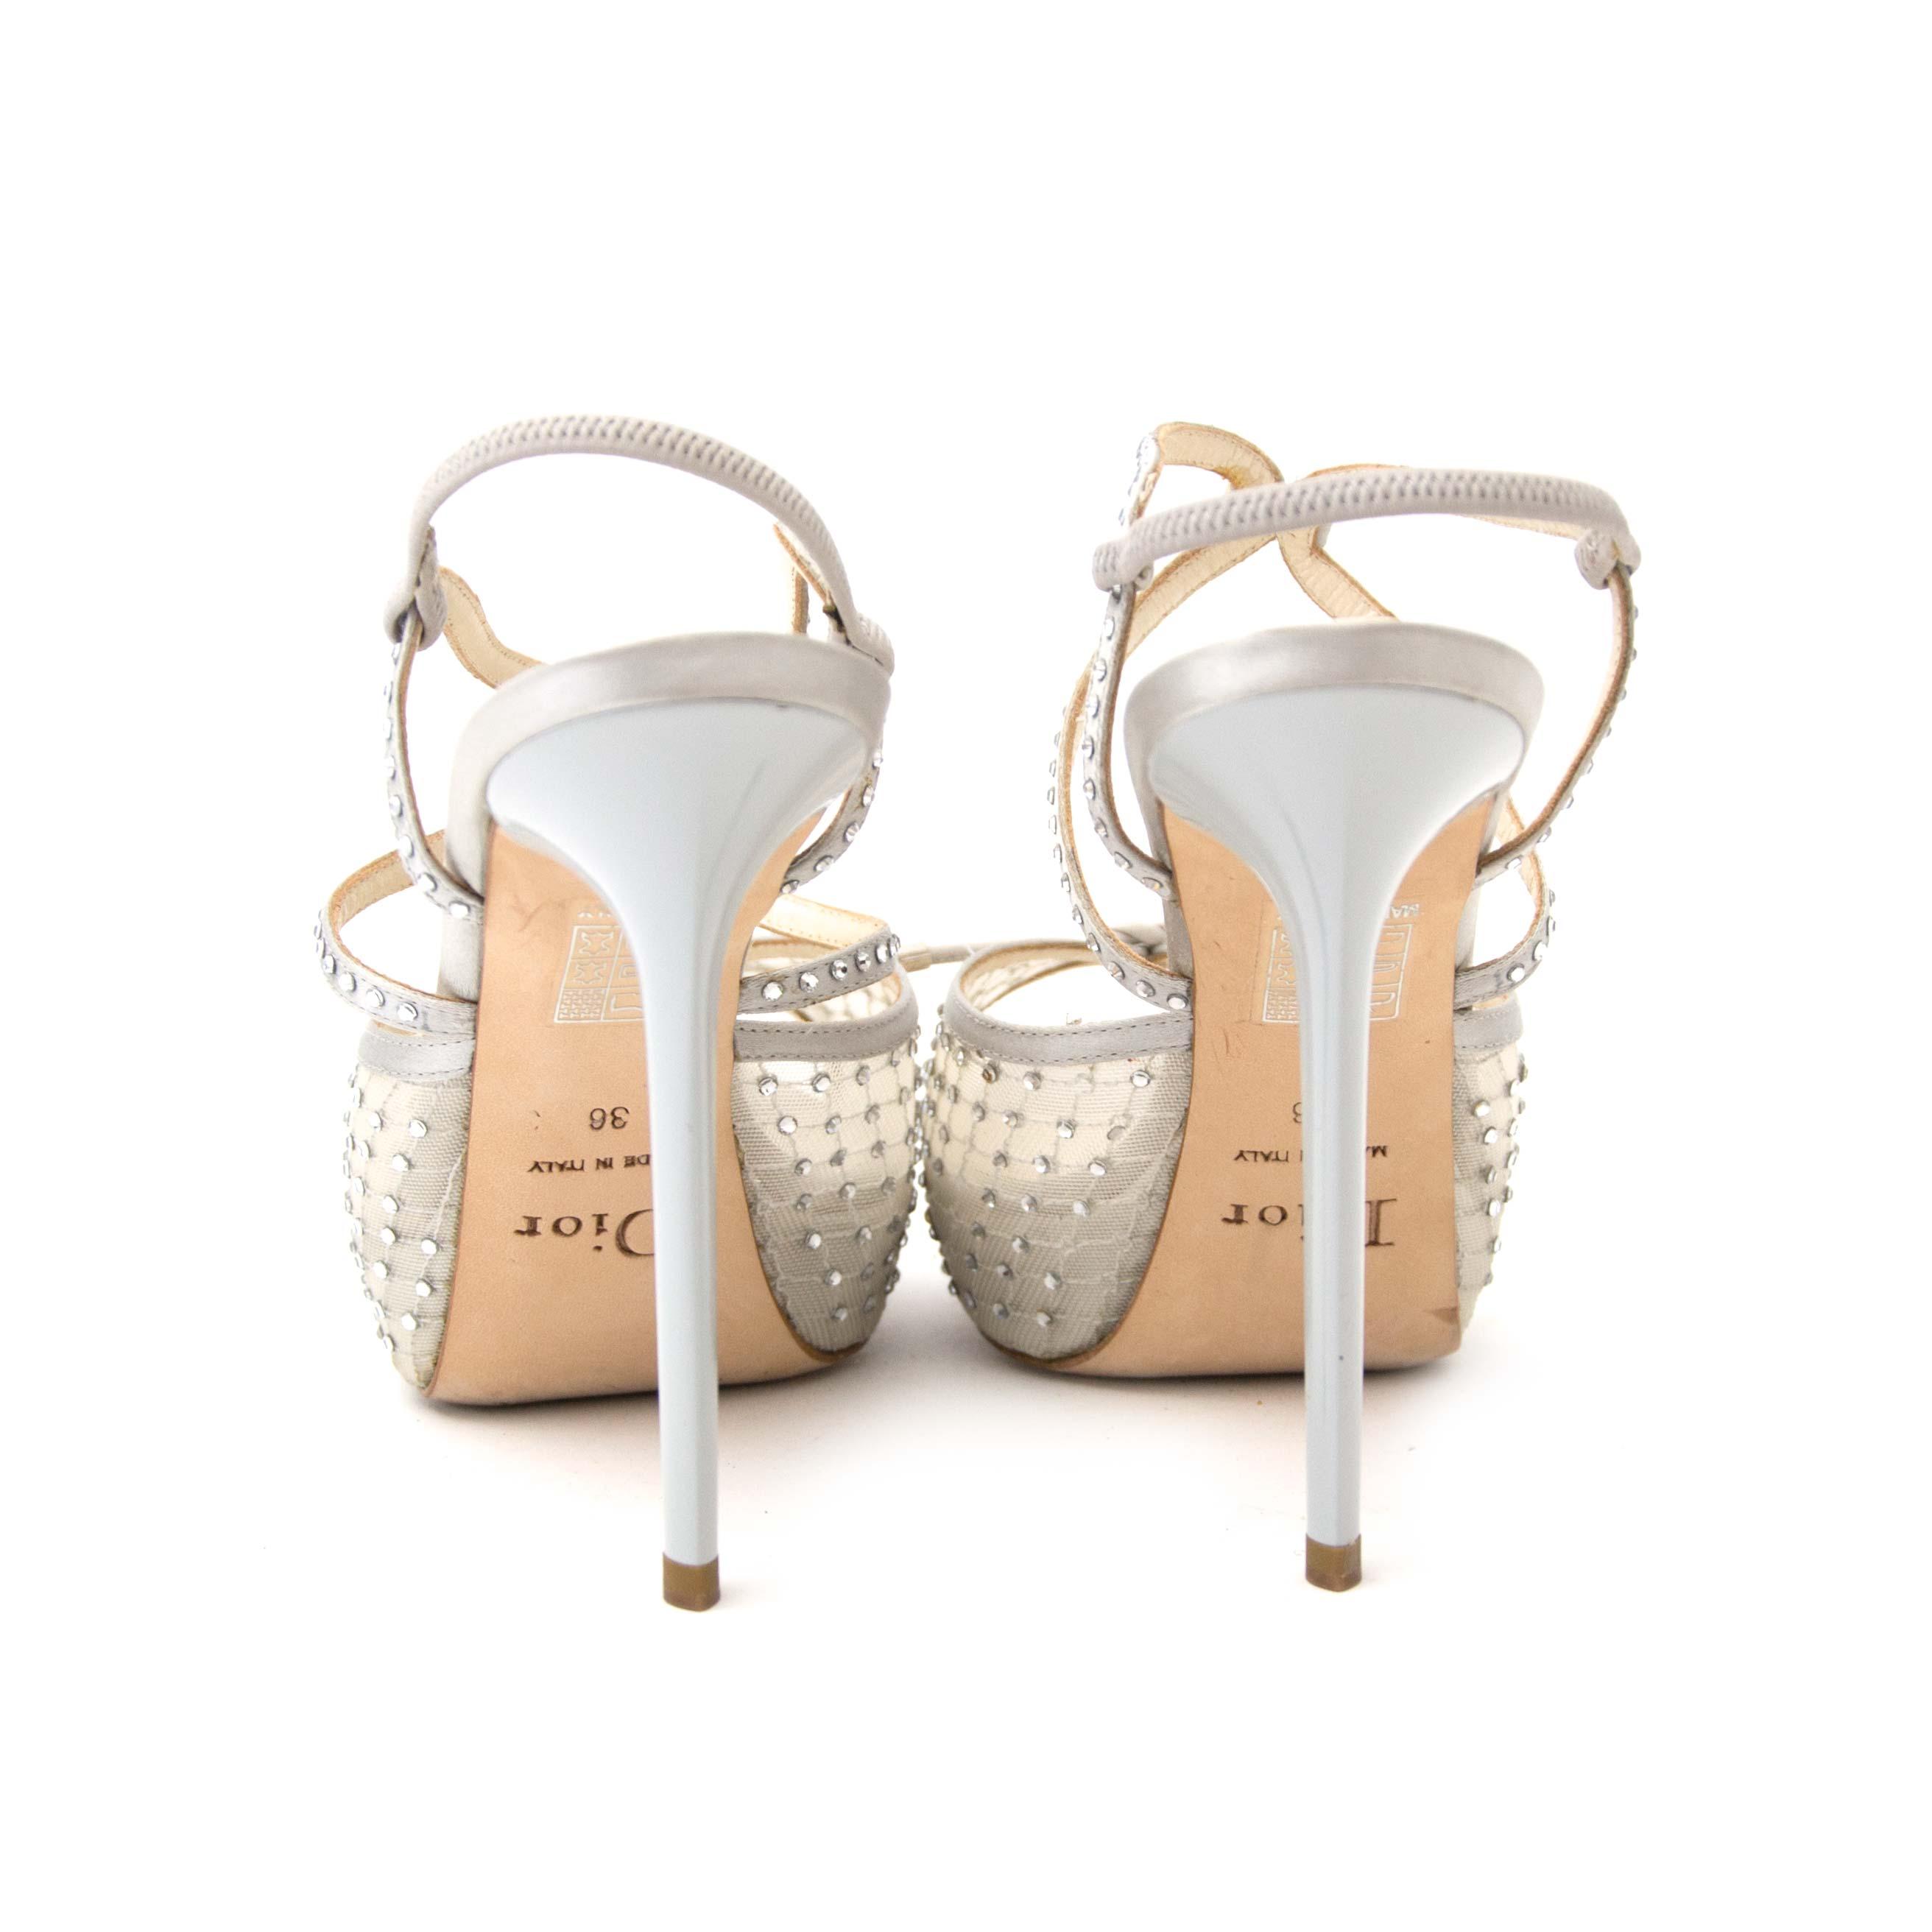 31f59a60048 Labellov Christian Dior Silver Crystal Platform Sandals - size 36 ...